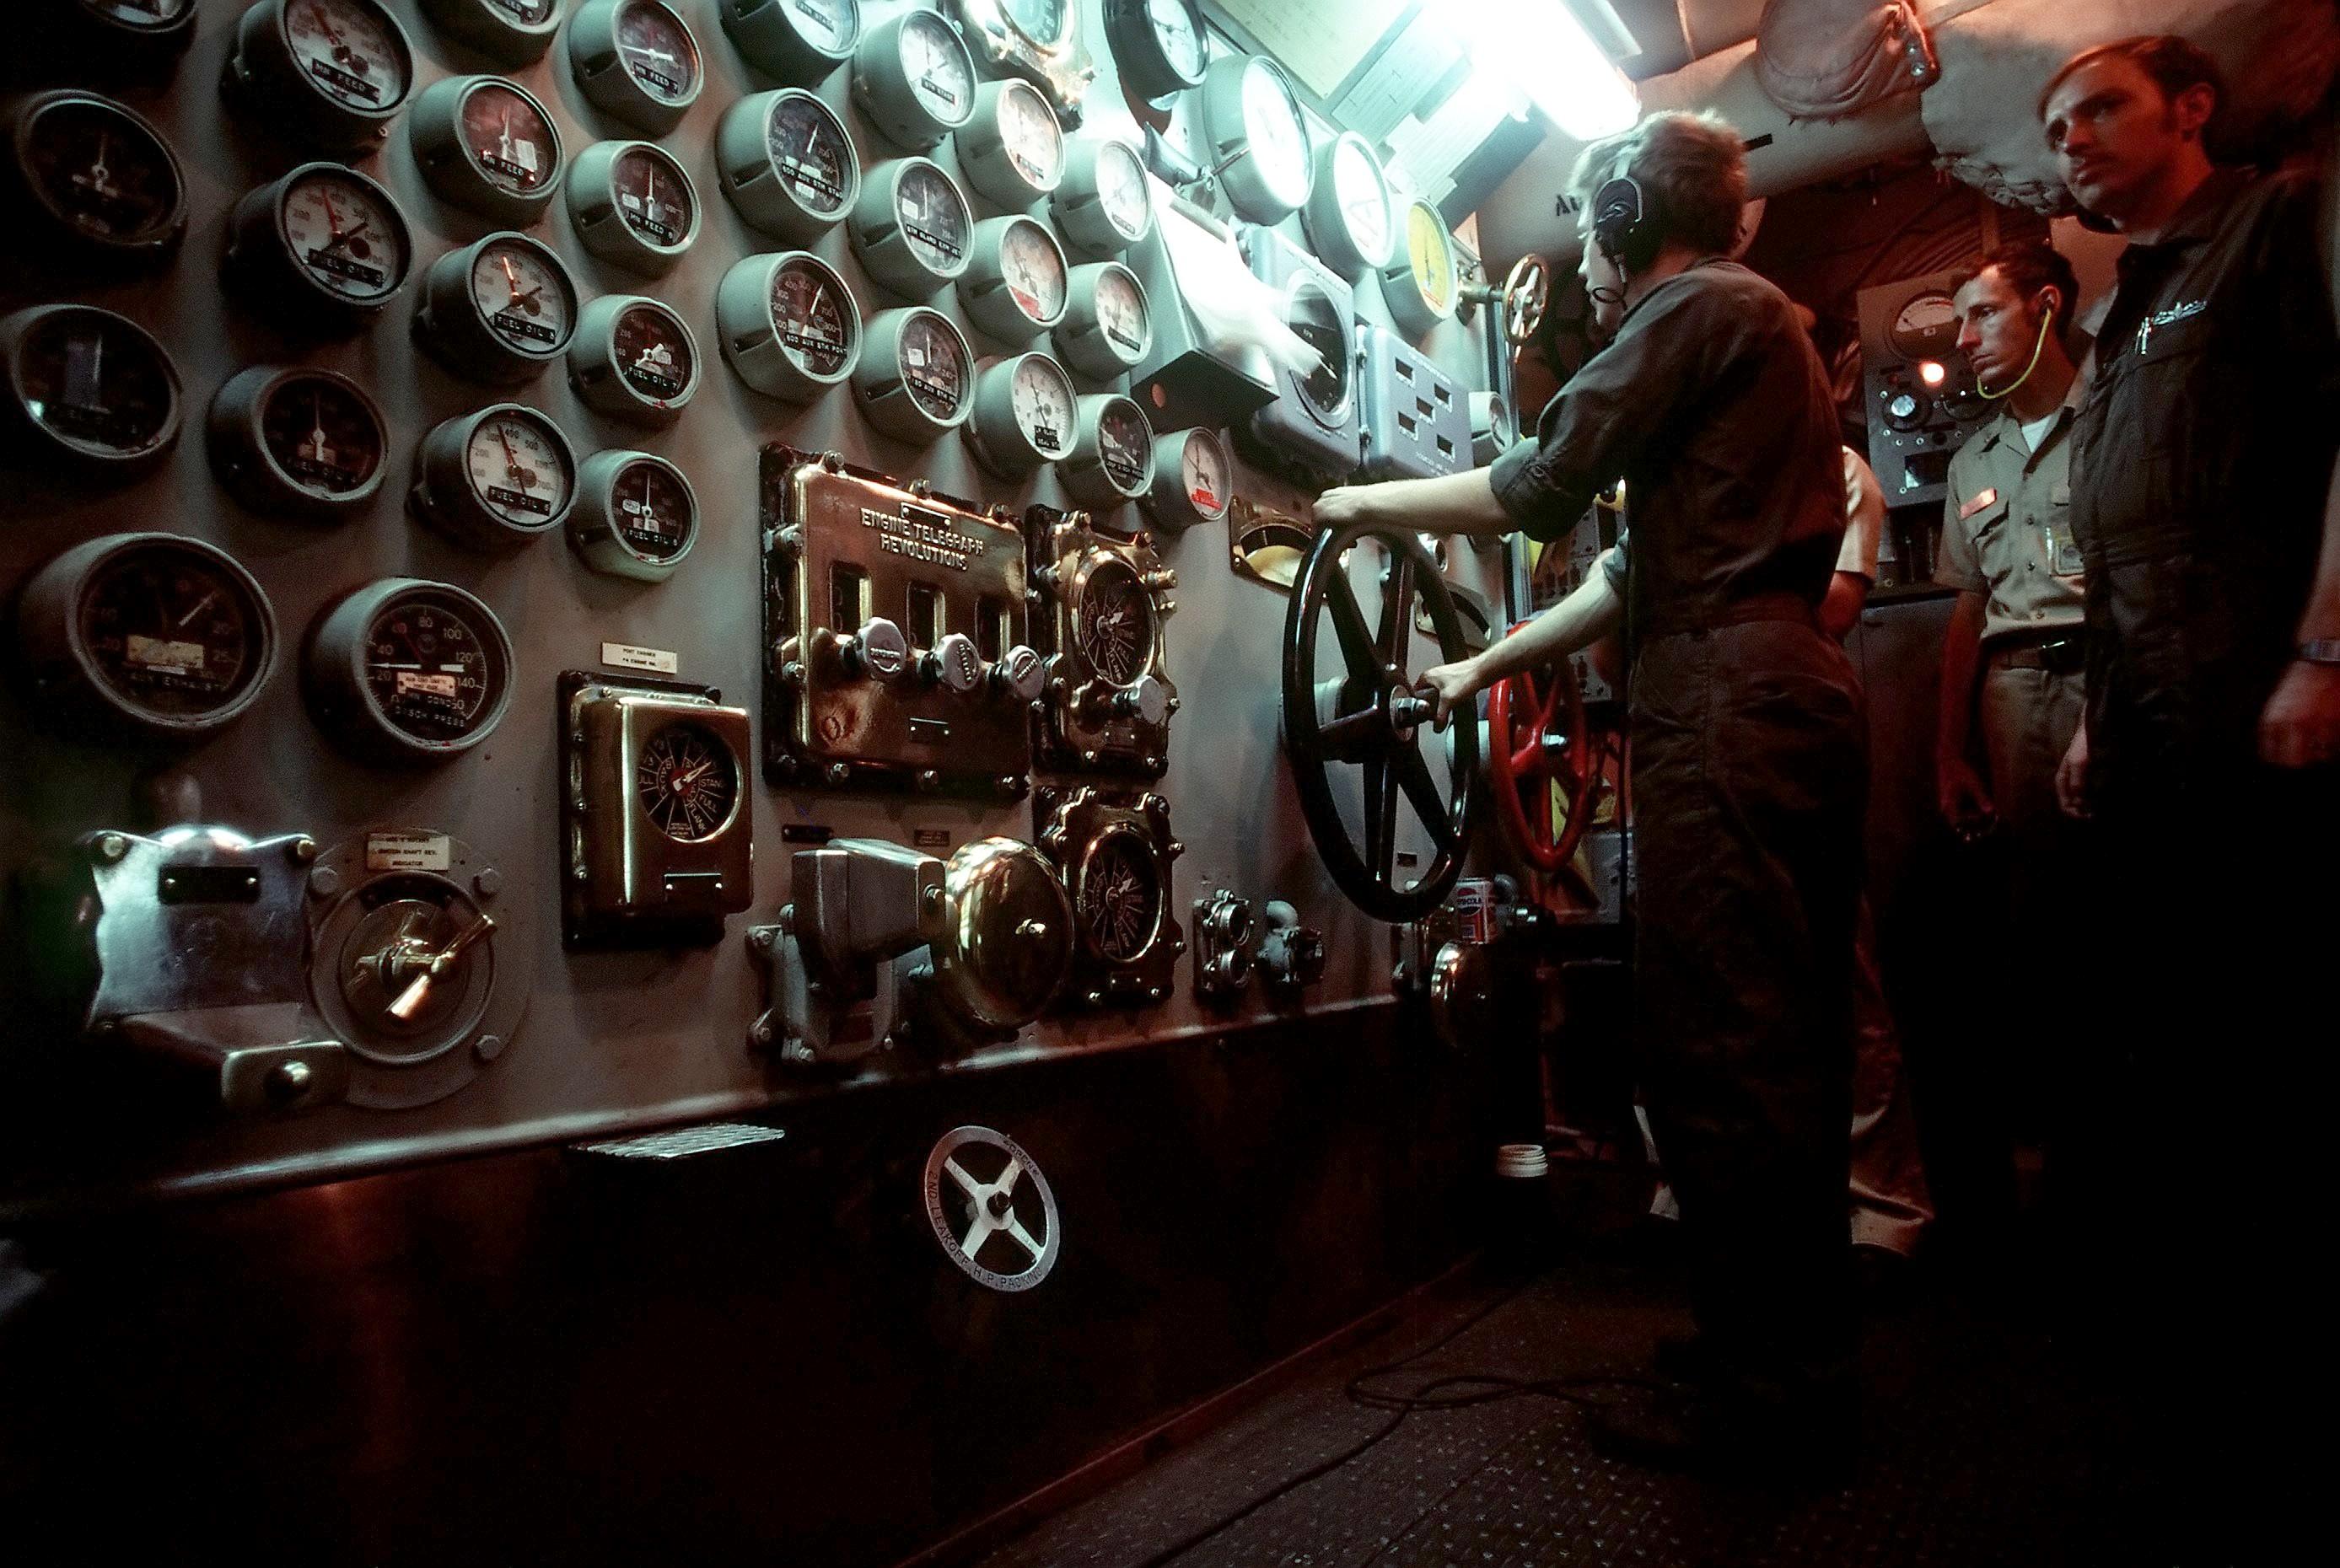 uss_new_jersey_engine_room_controls.jpg